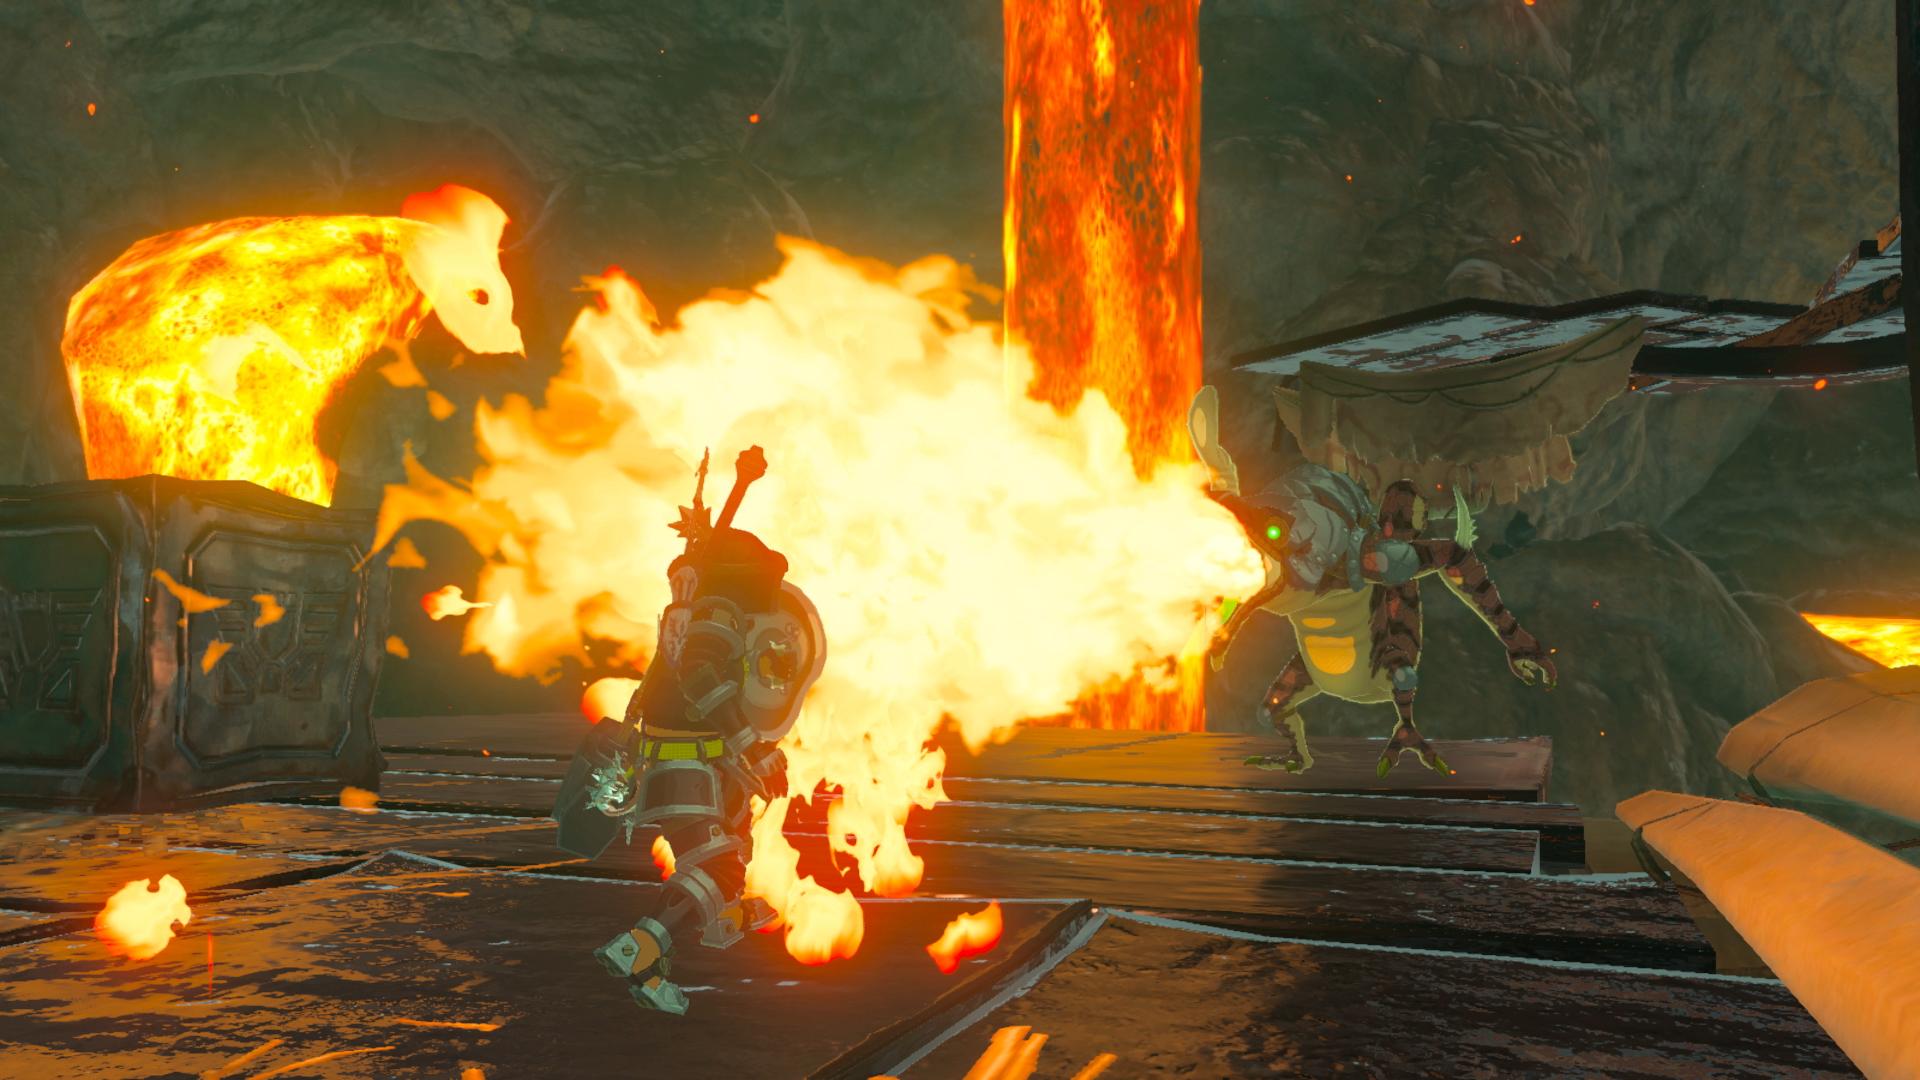 The Legend of Zelda: Breath of the Wild image 13